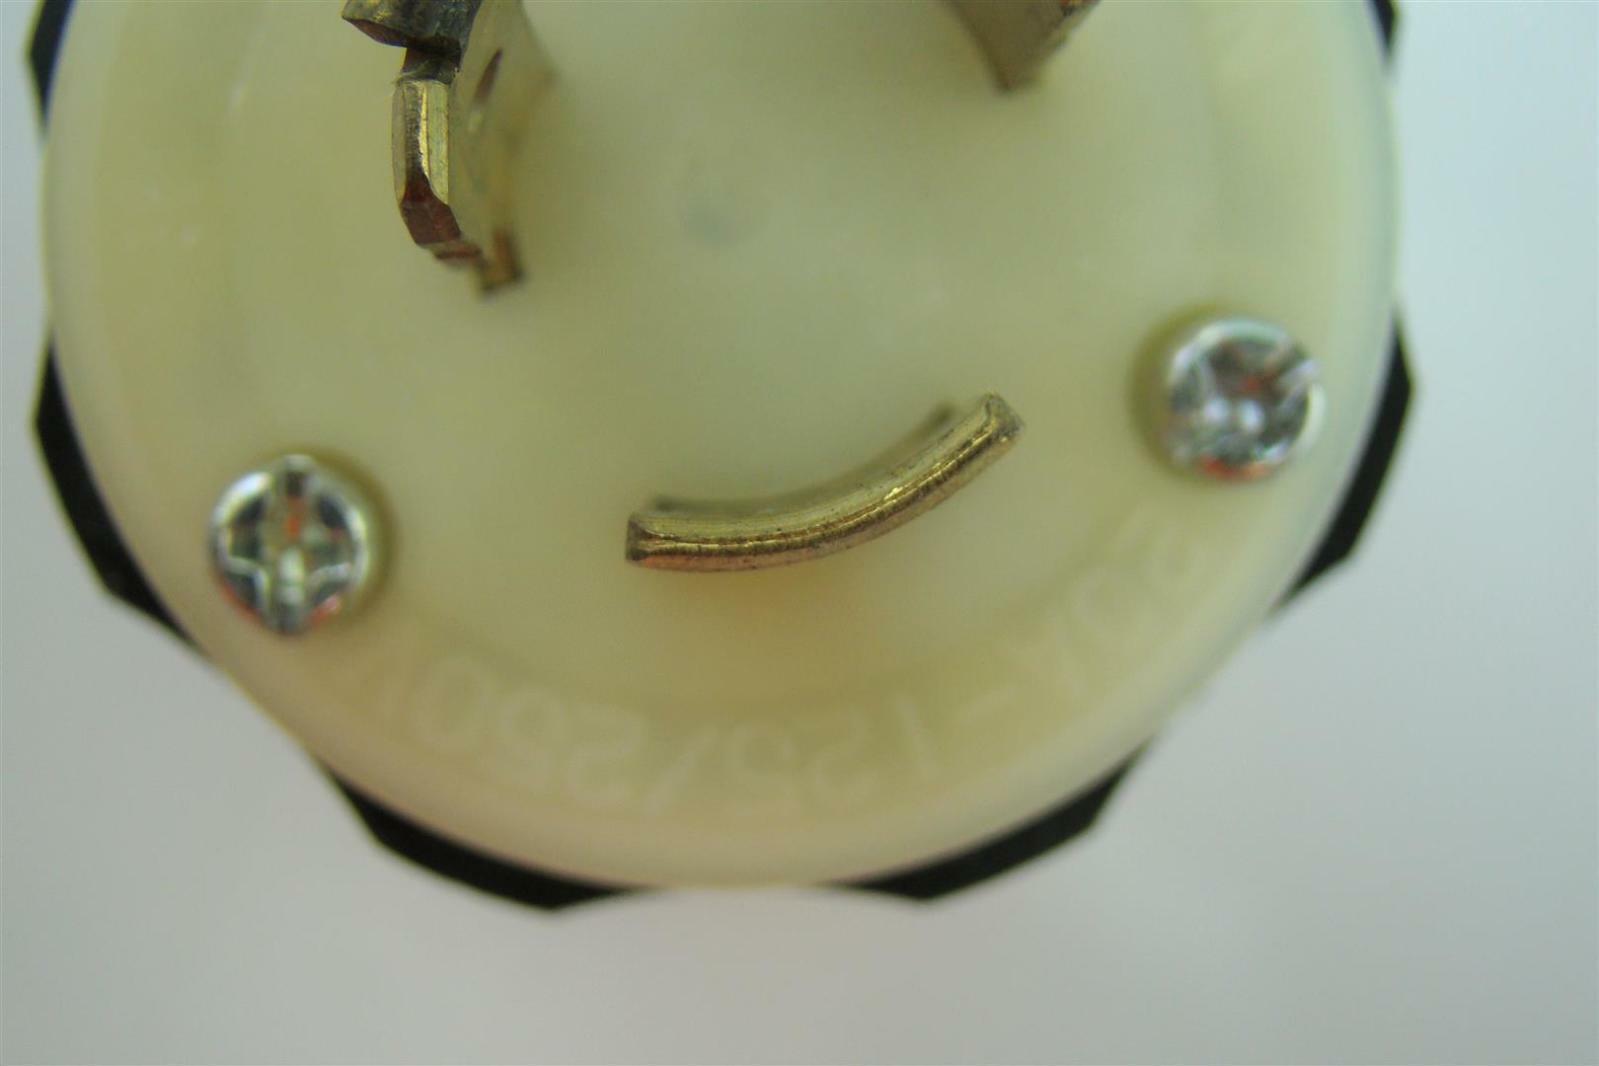 Leviton 9965-C 20Amp 125/250V Locking Plug 9965-C | eBay